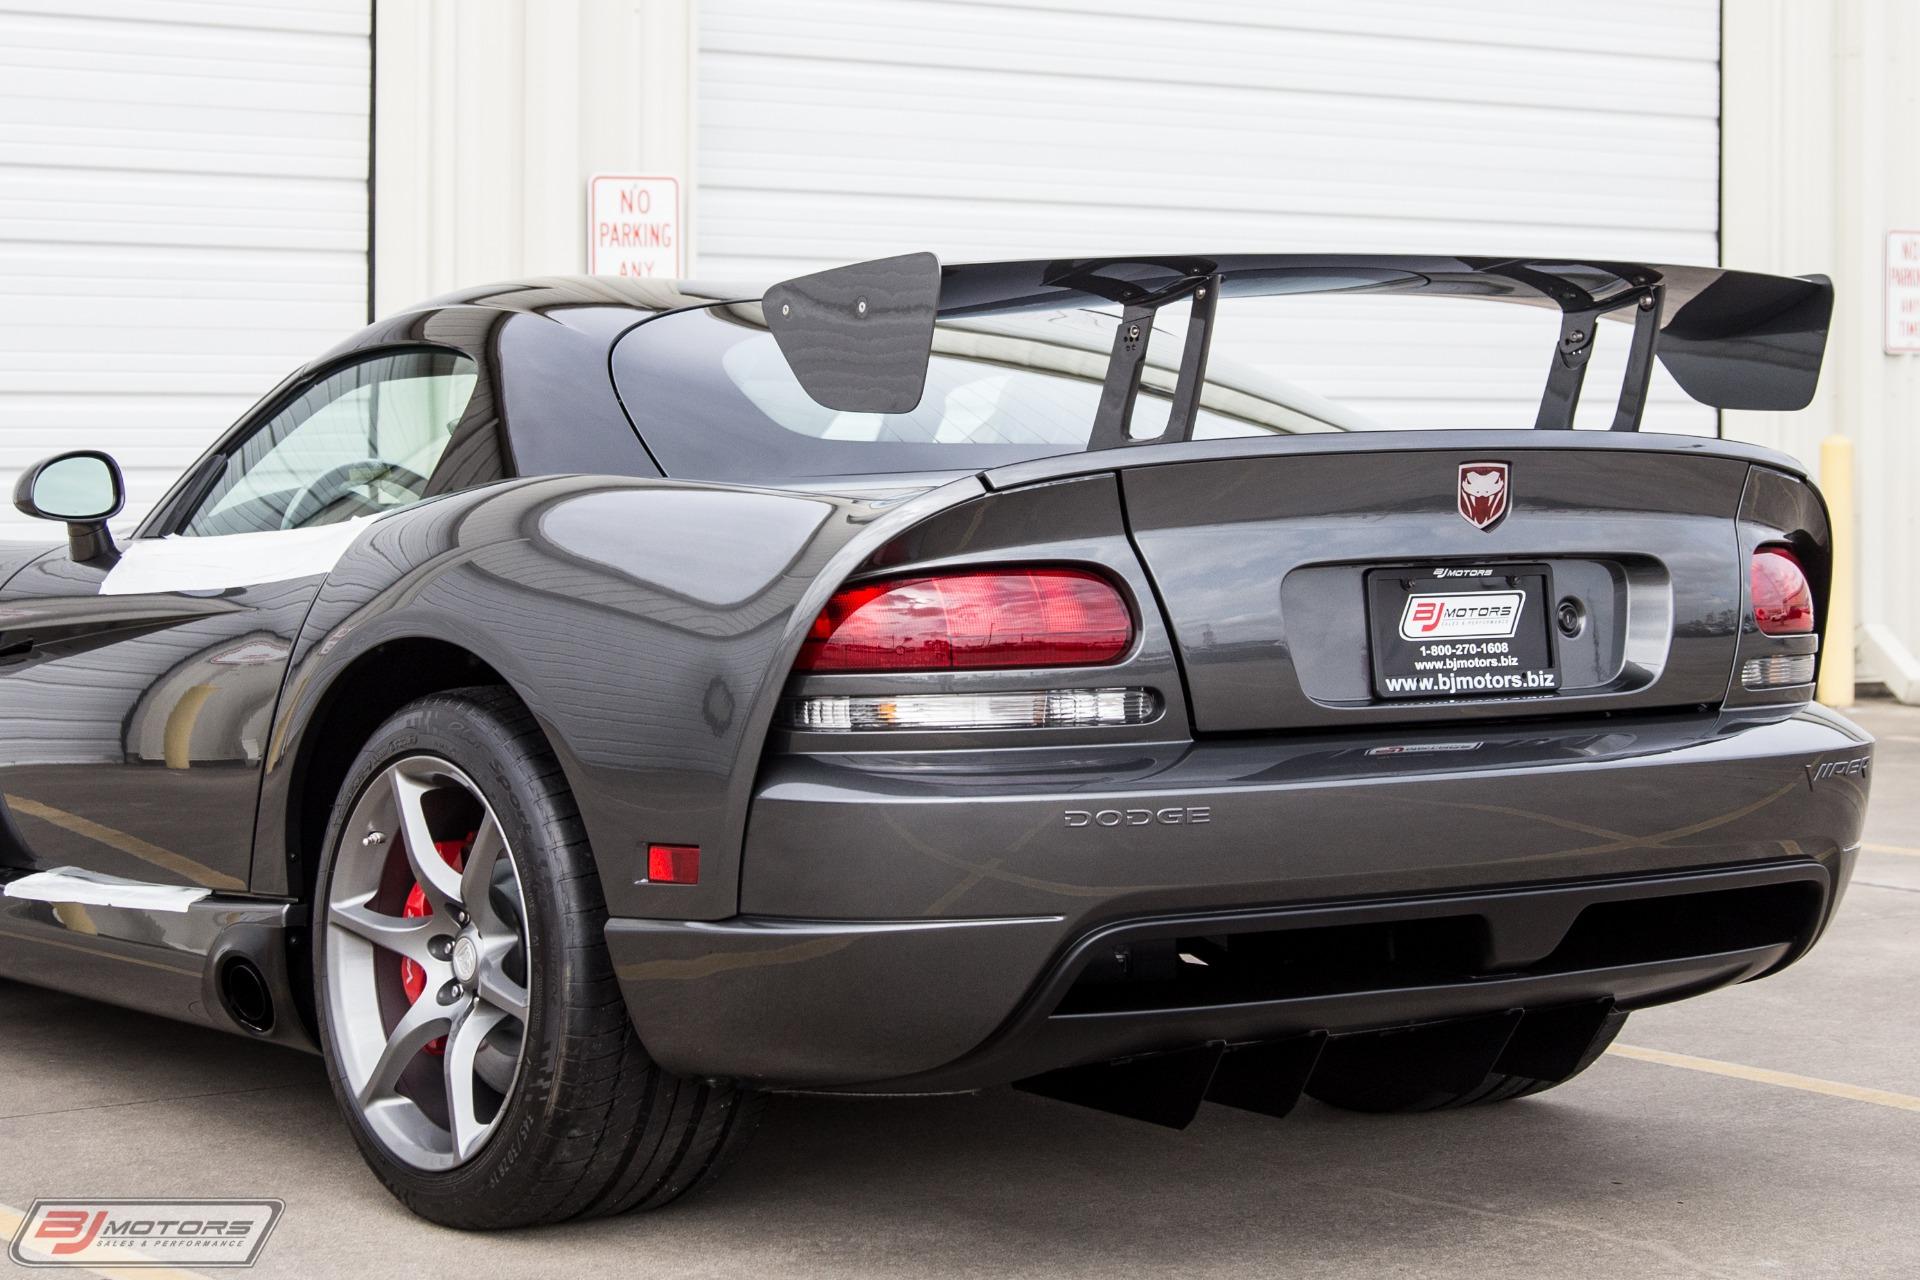 Used-2010-Dodge-Viper-SRT-10-Final-Edition-1-of-1-Aero-Coupe